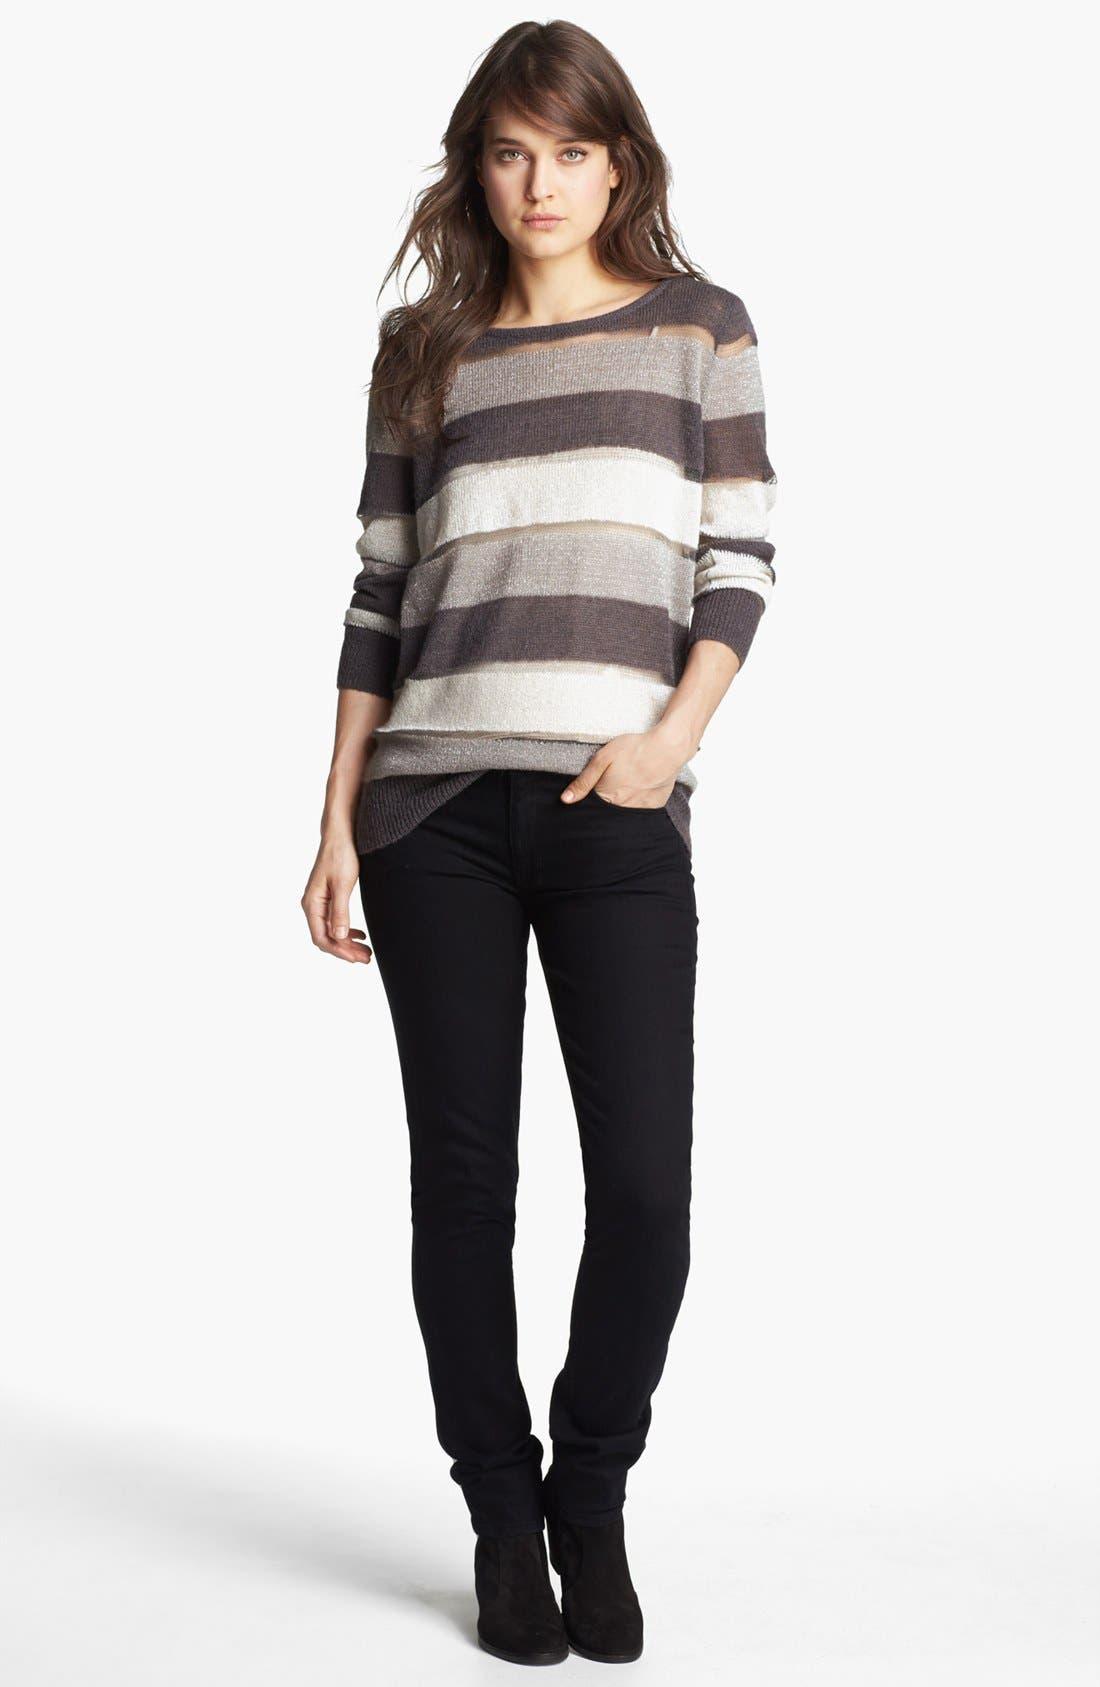 Main Image - Hinge Sweater & Hudson Jeans Skinny Jeans